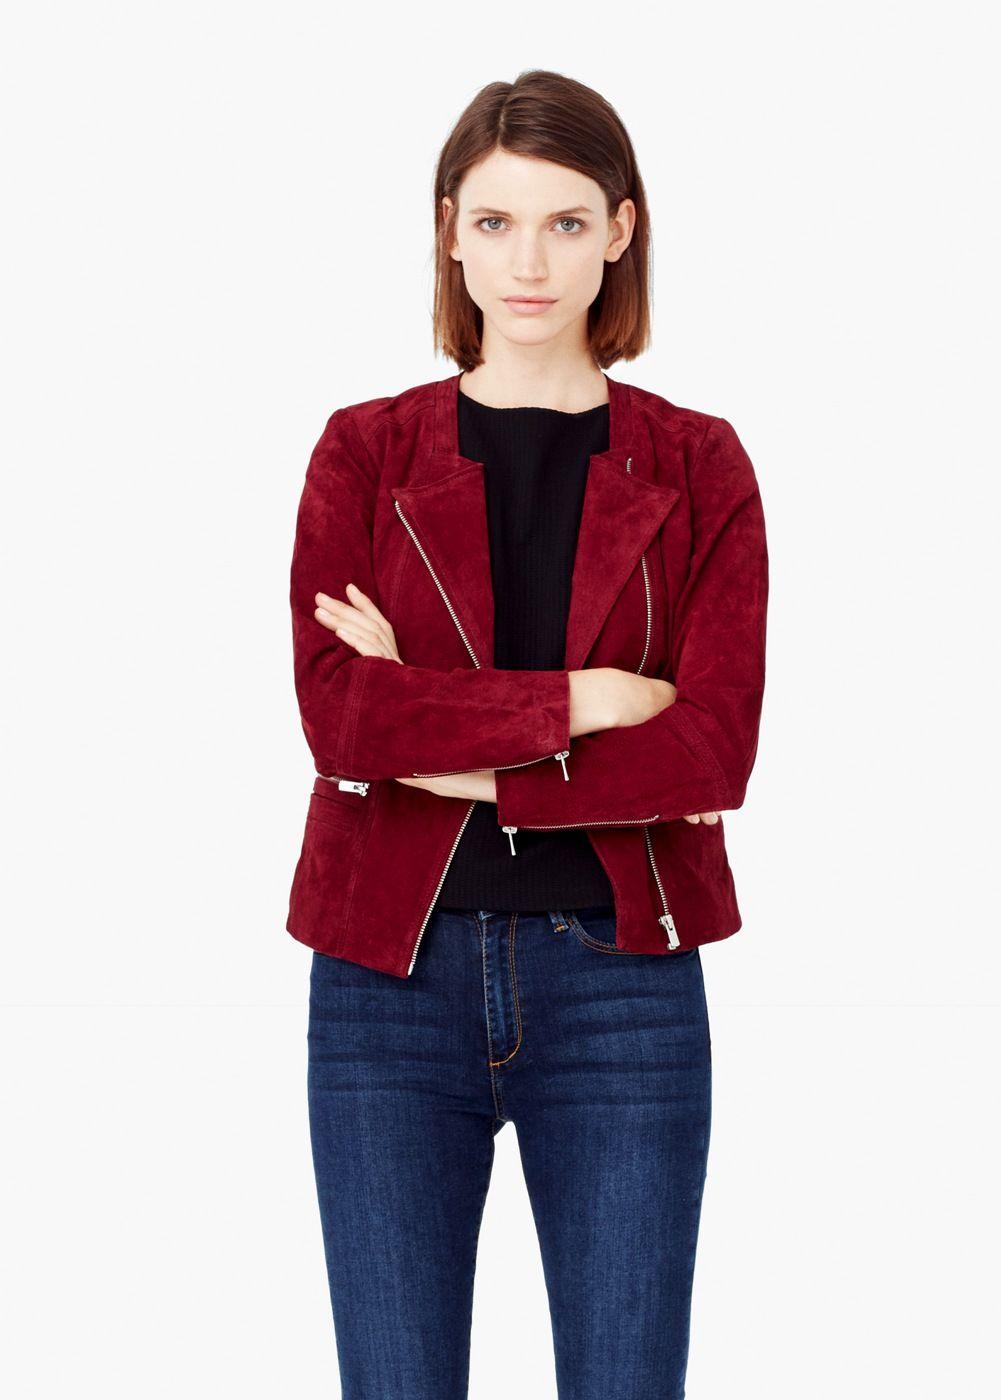 Zipped suede jacket - Jackets for Women | MANGO | jackets, coats ...